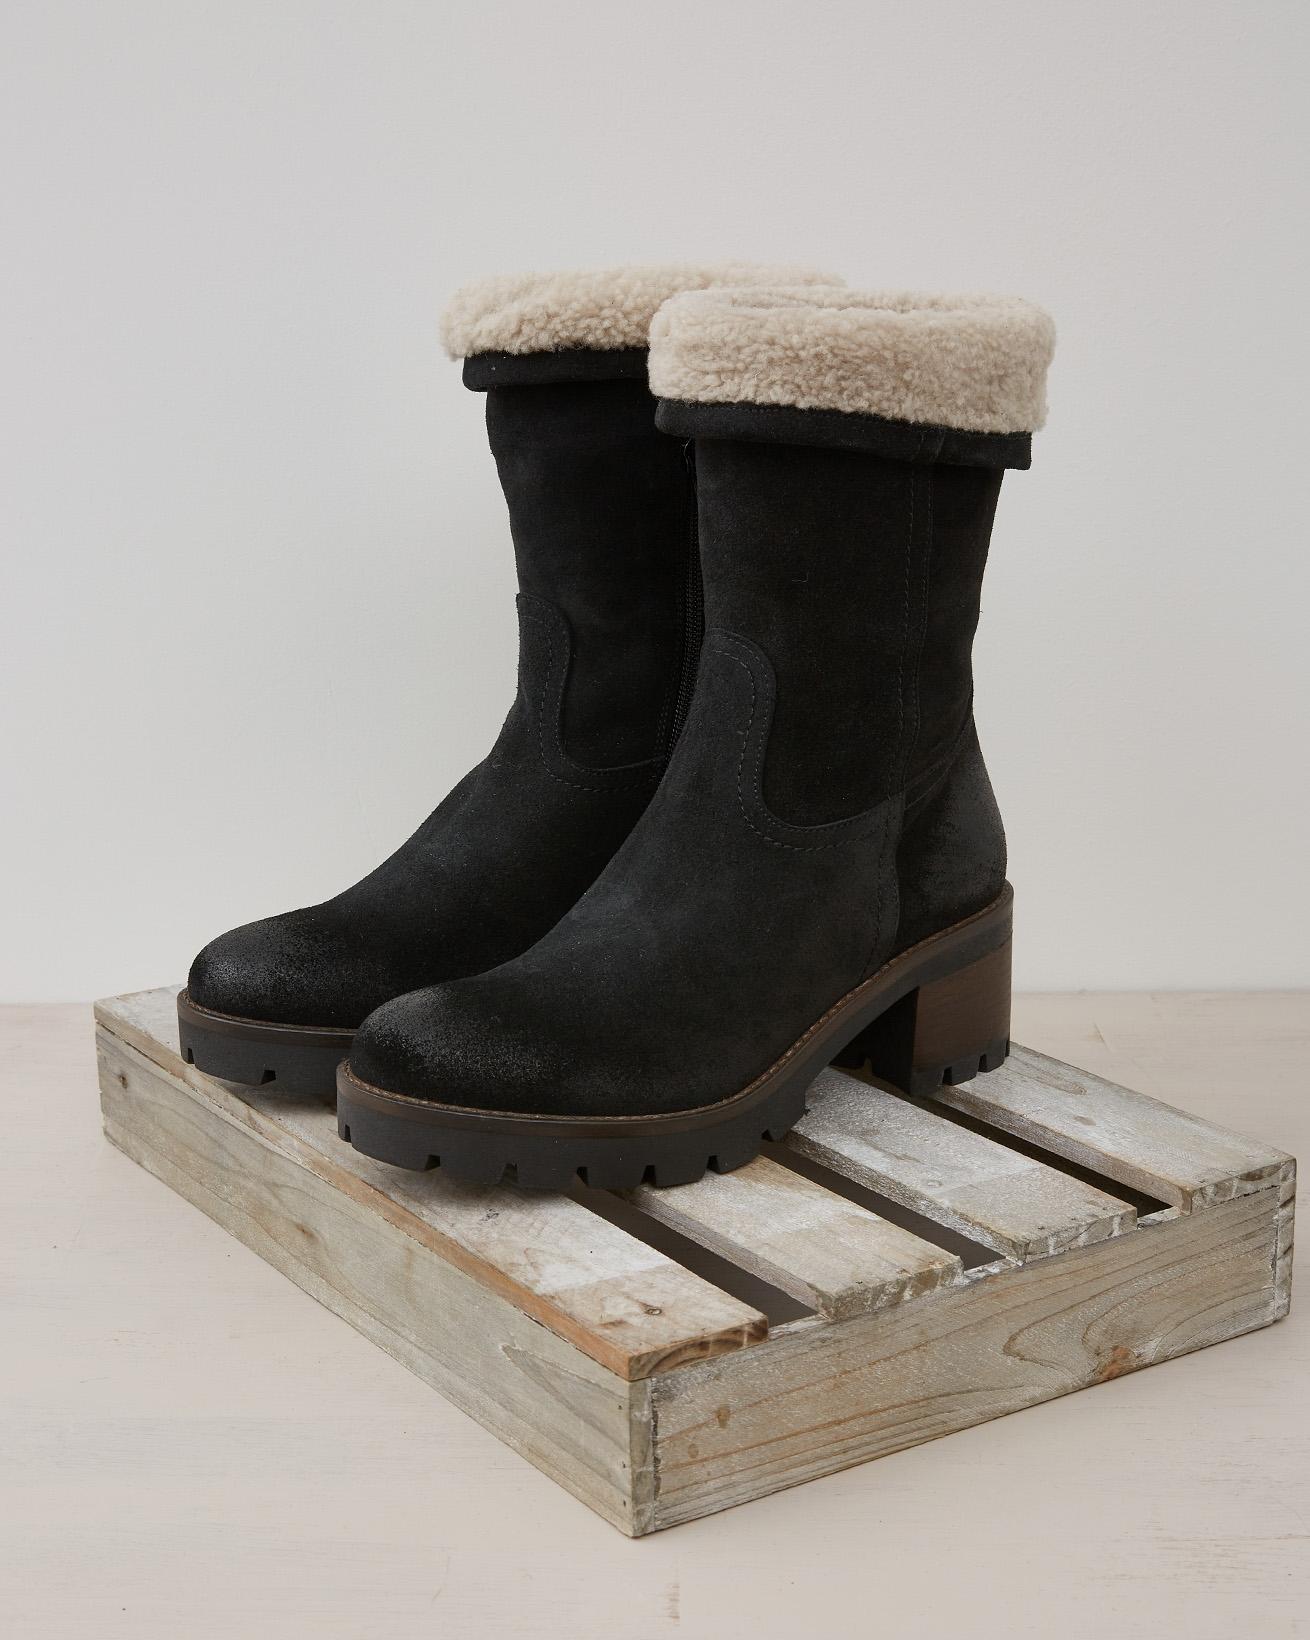 Fold Down Sheepskin Cuff Block Heel Boot - Black - Size 39 - 2446